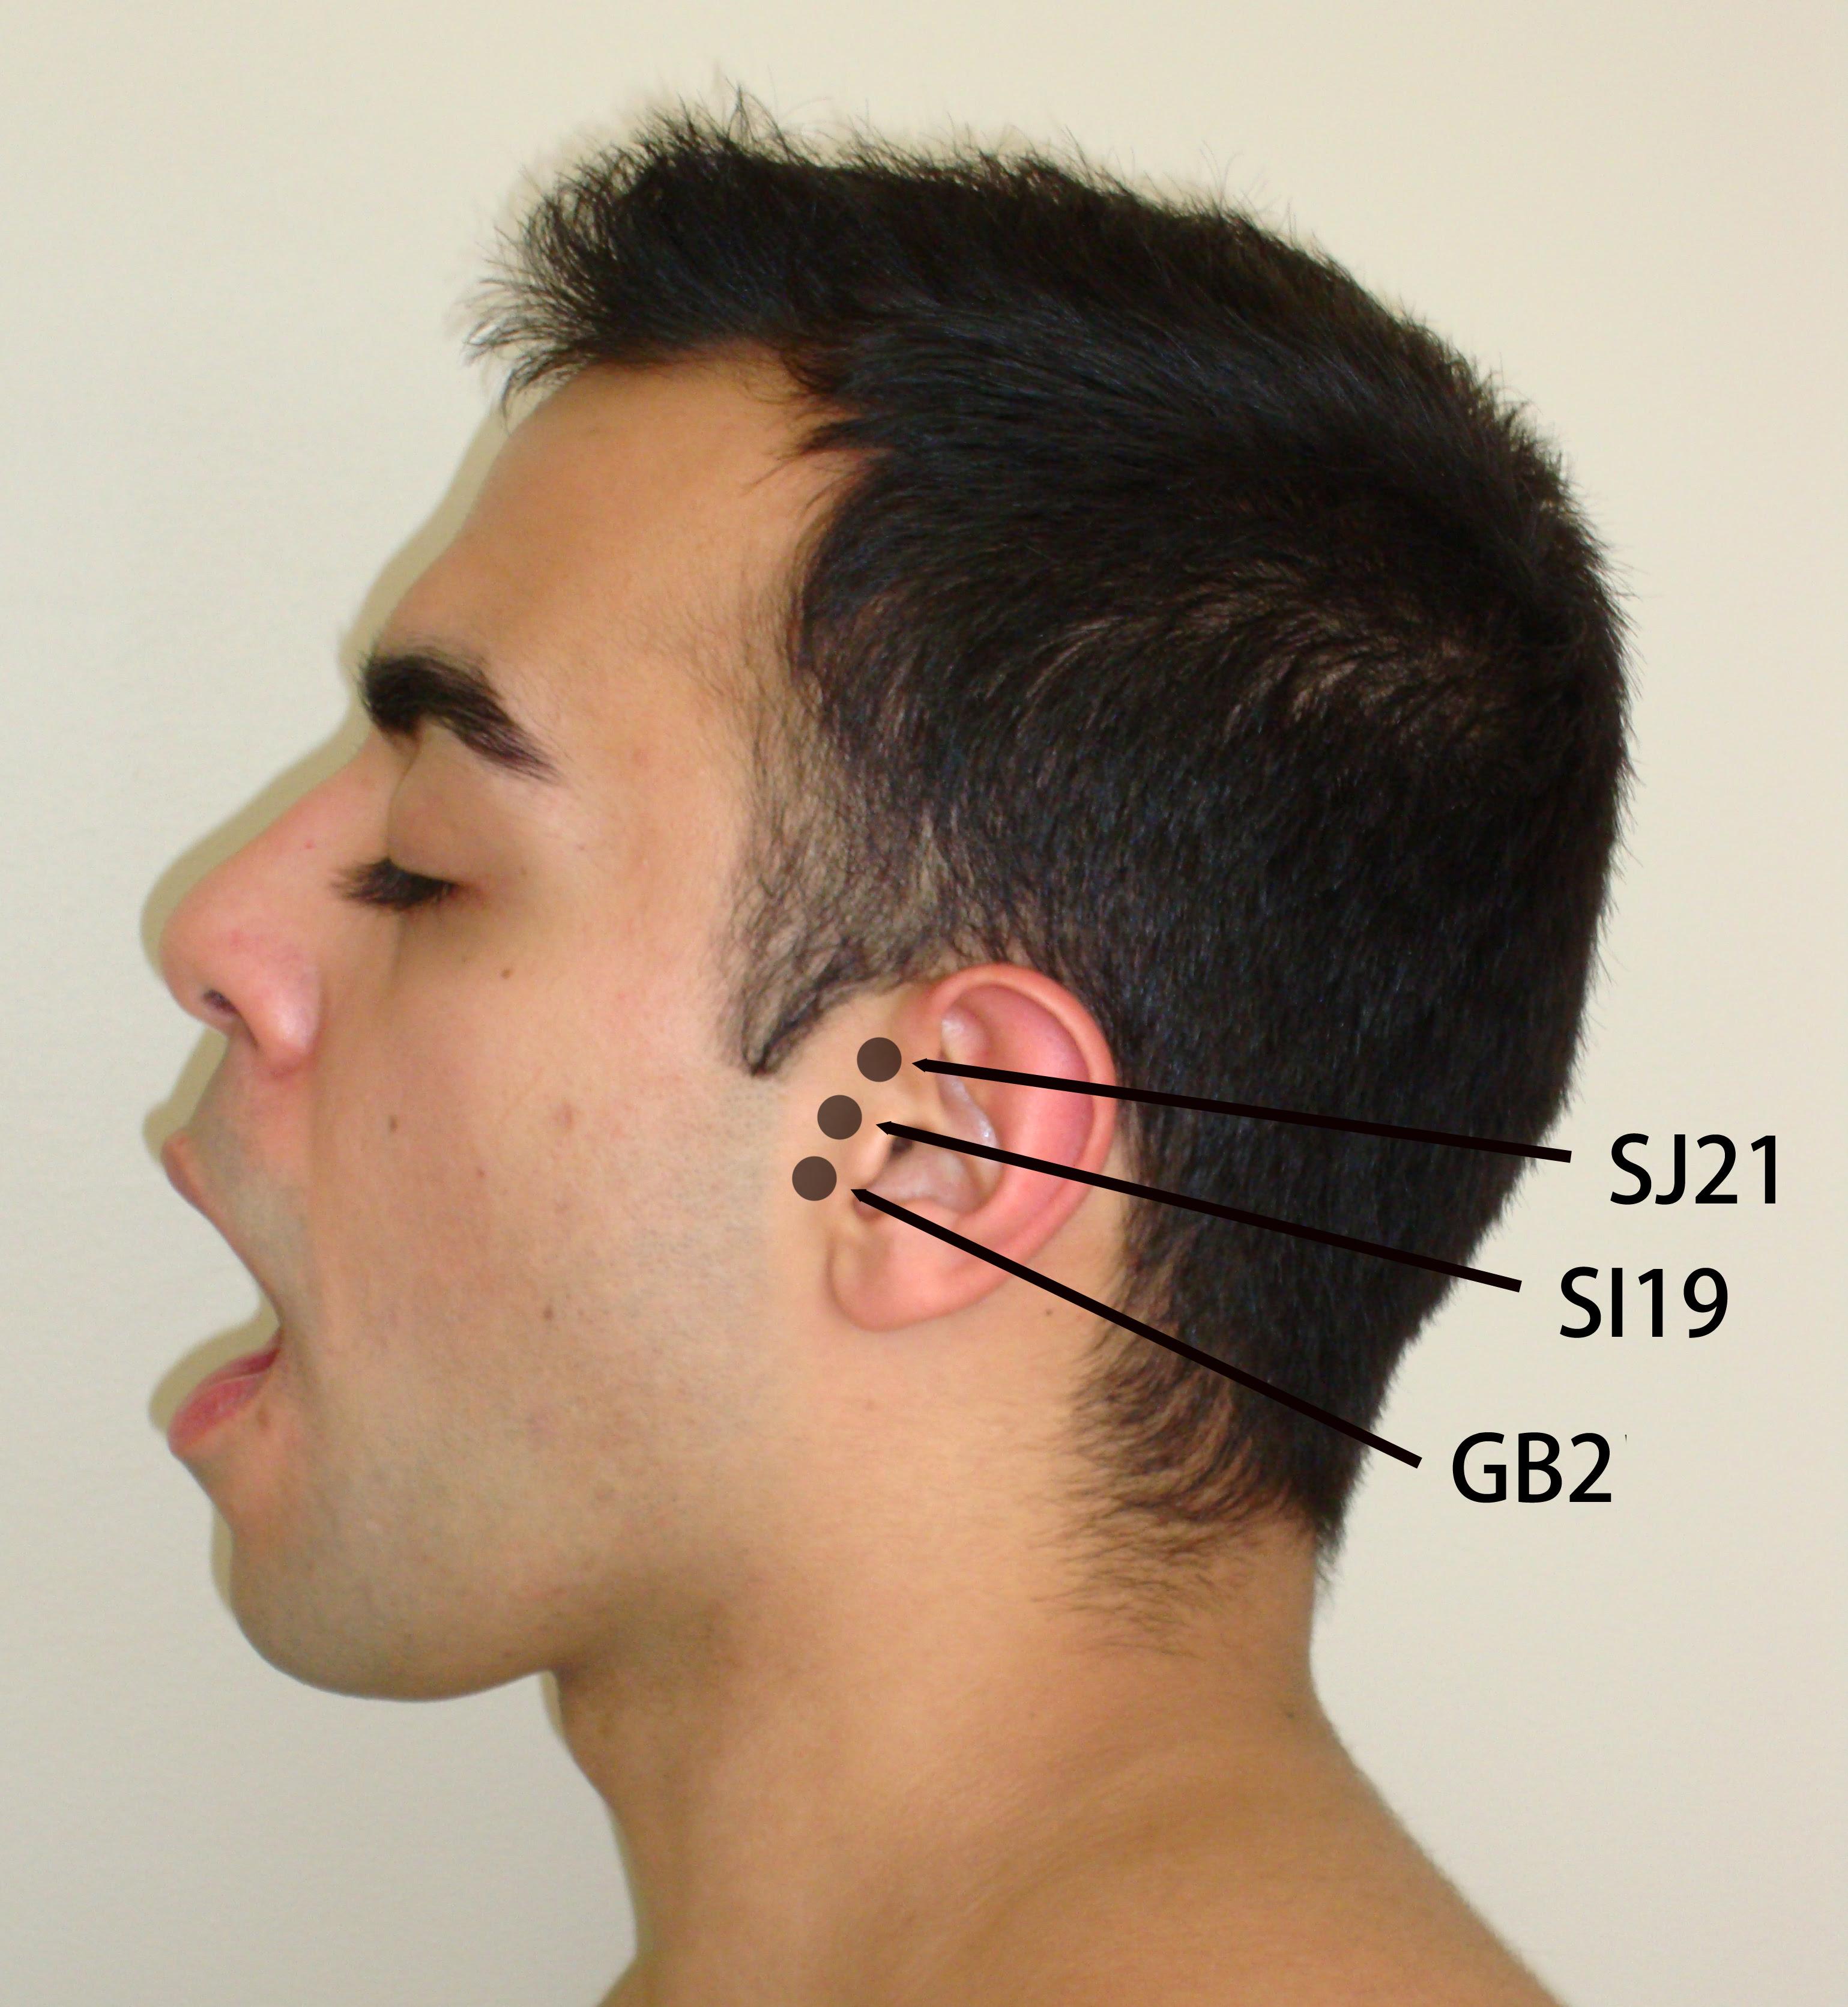 Acupuncture And Tinnitus Treatment - Acupuncture ...